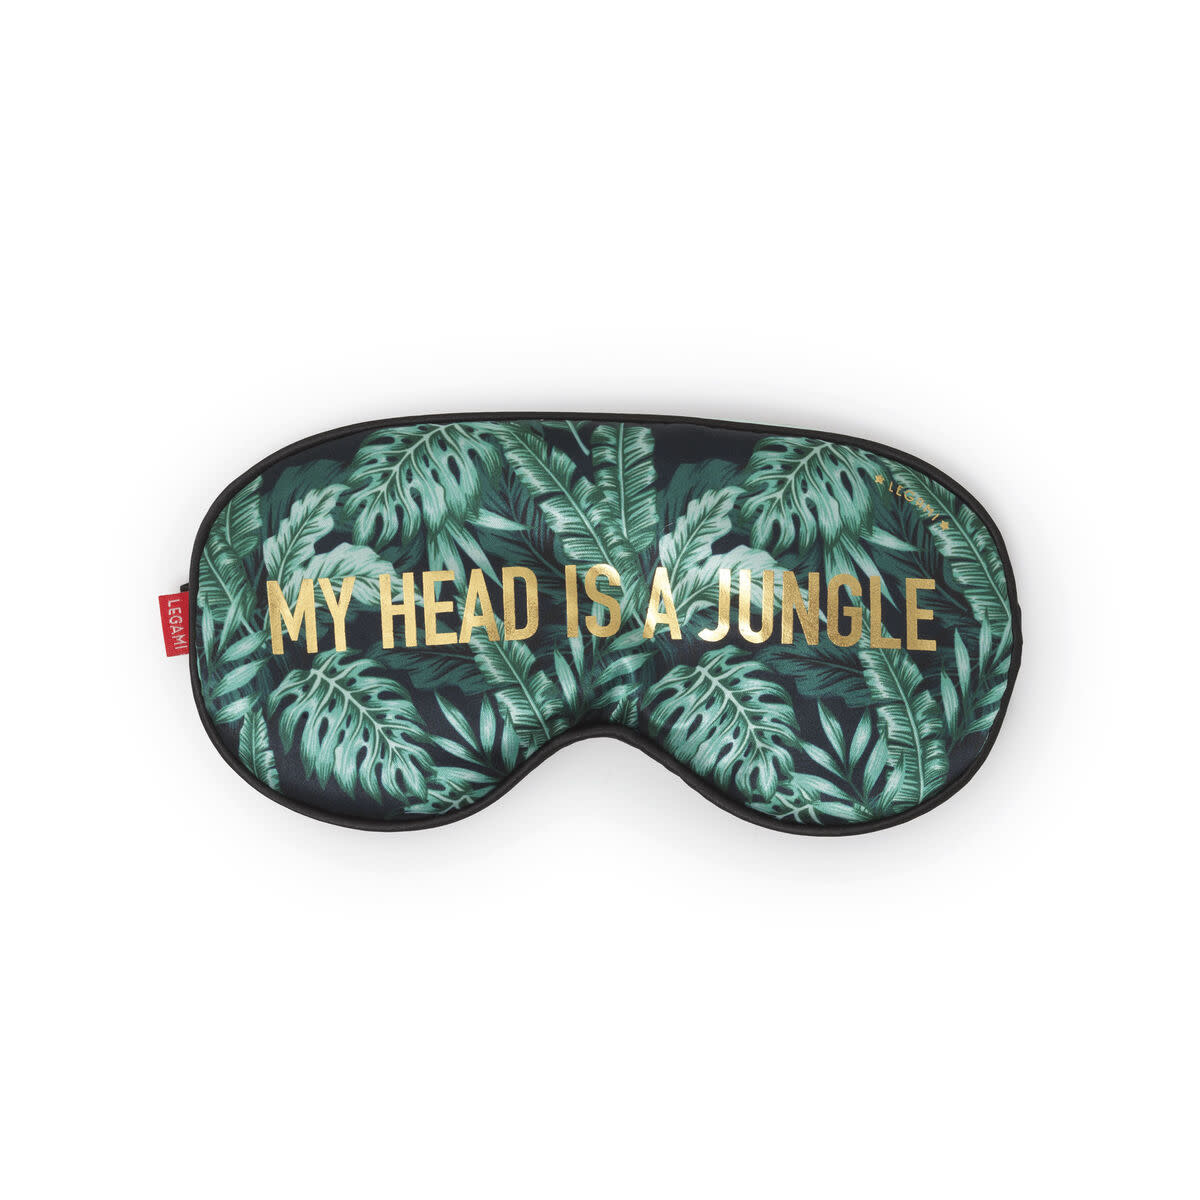 Legami Nap queen sleep mask - my head is a jungle